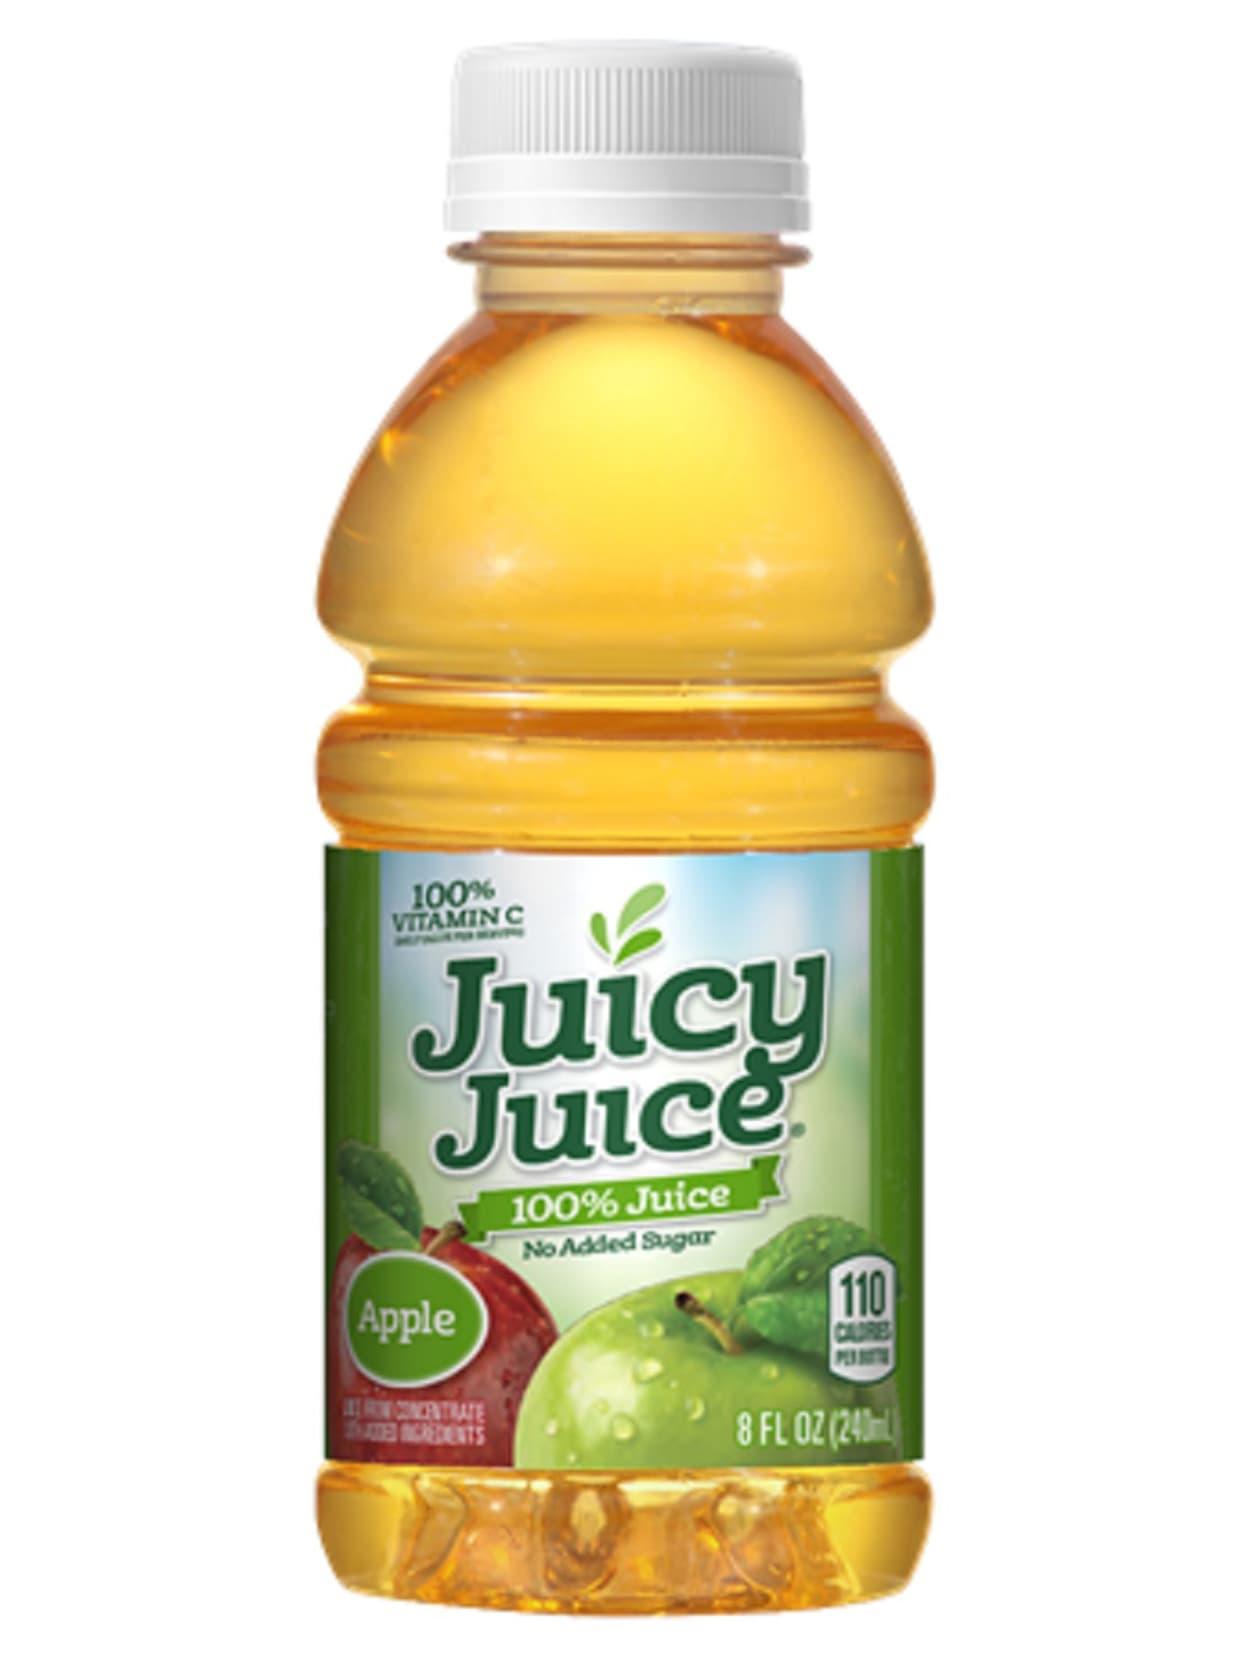 Juicy Juice Apple Juice 10 Oz Pack Of 24 Office Depot The greatest little kid drink ever. juicy juice apple juice 10 oz pack of 24 item 8272492